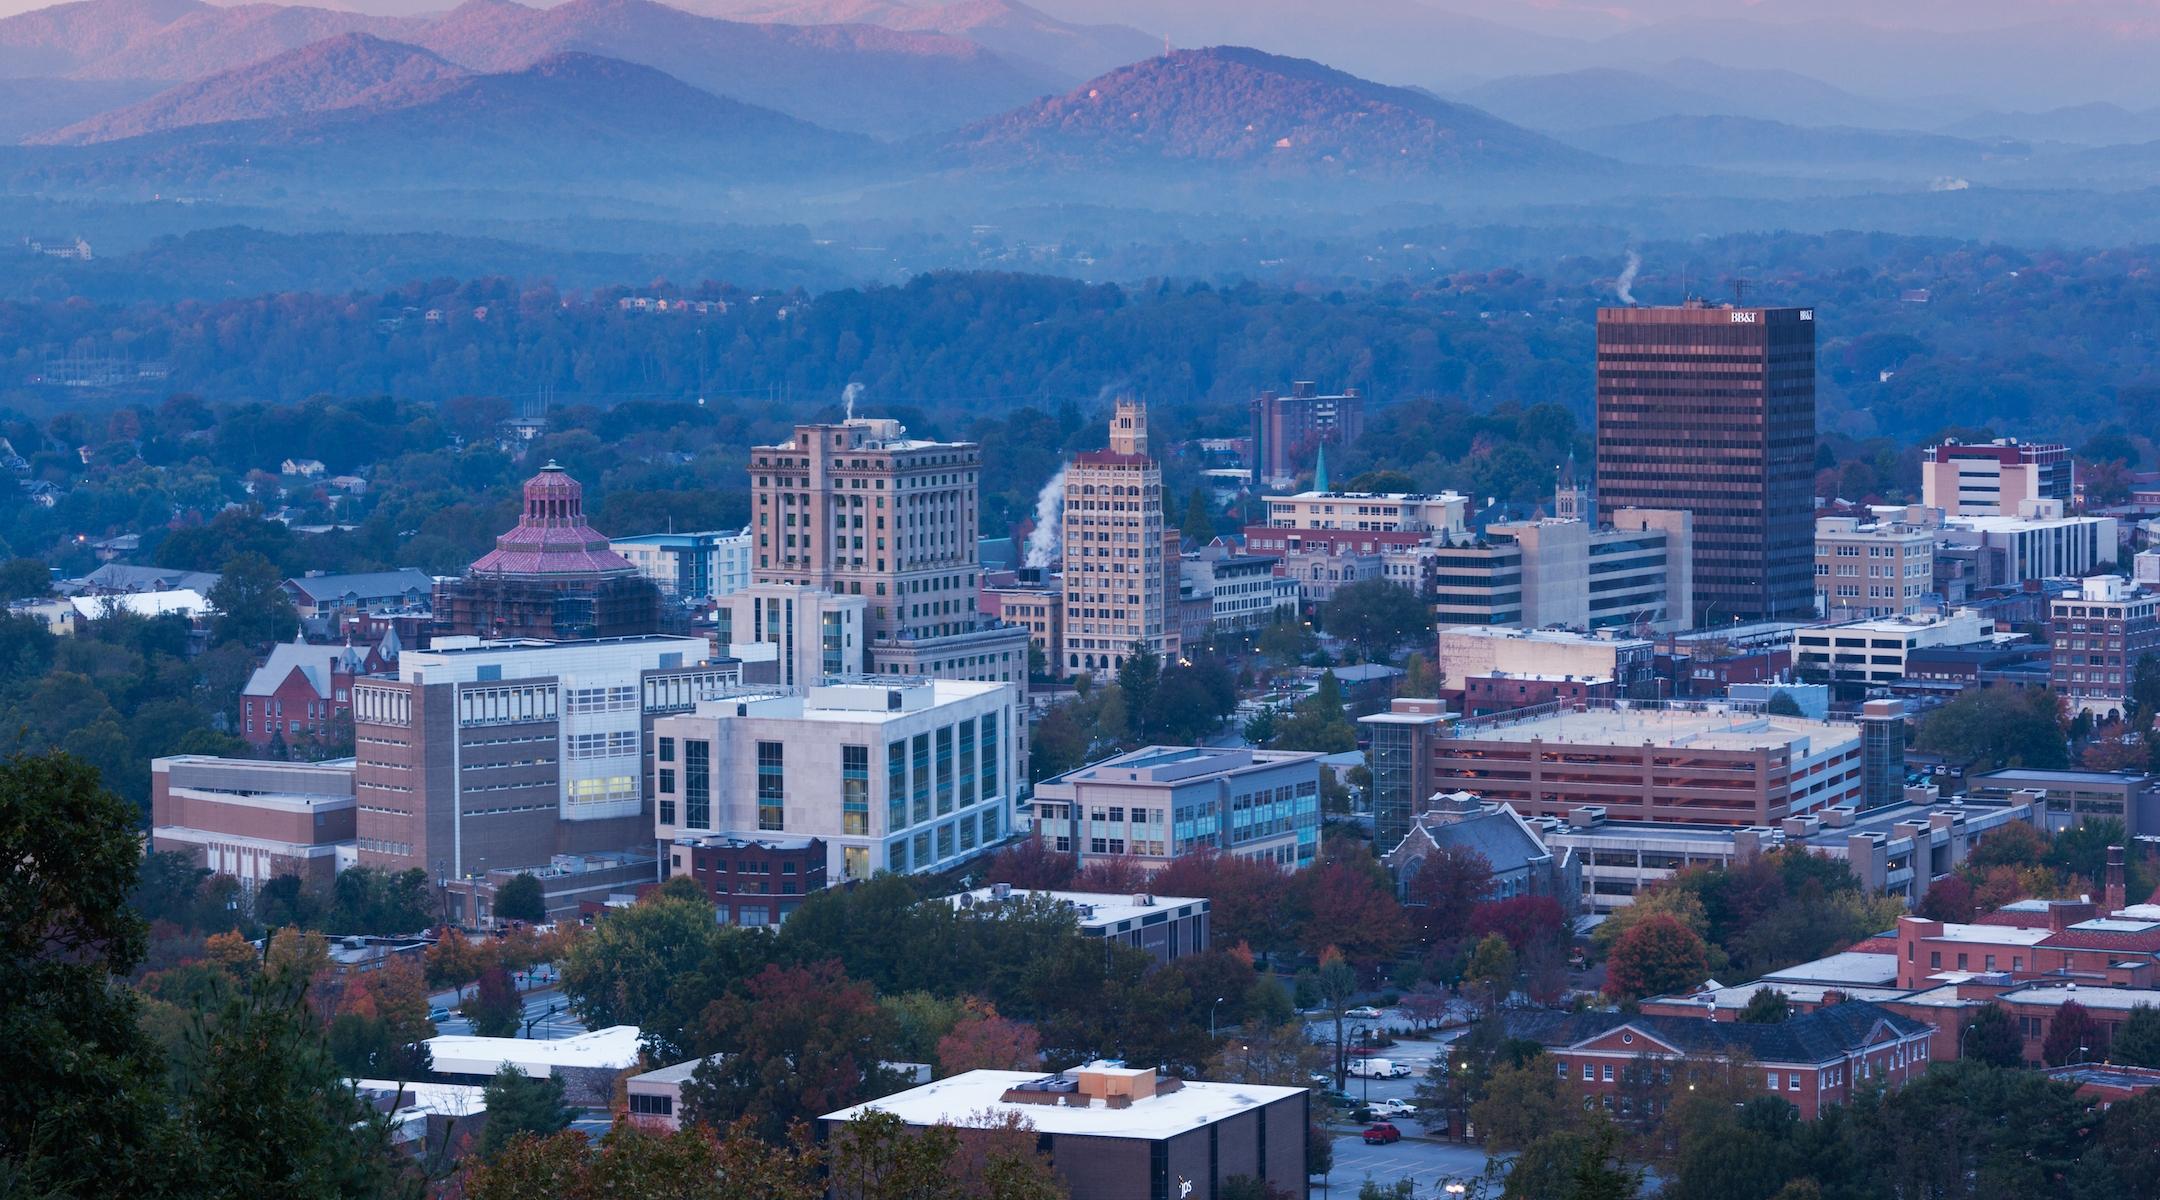 A view of Asheville, North Carolina. (Stock image)